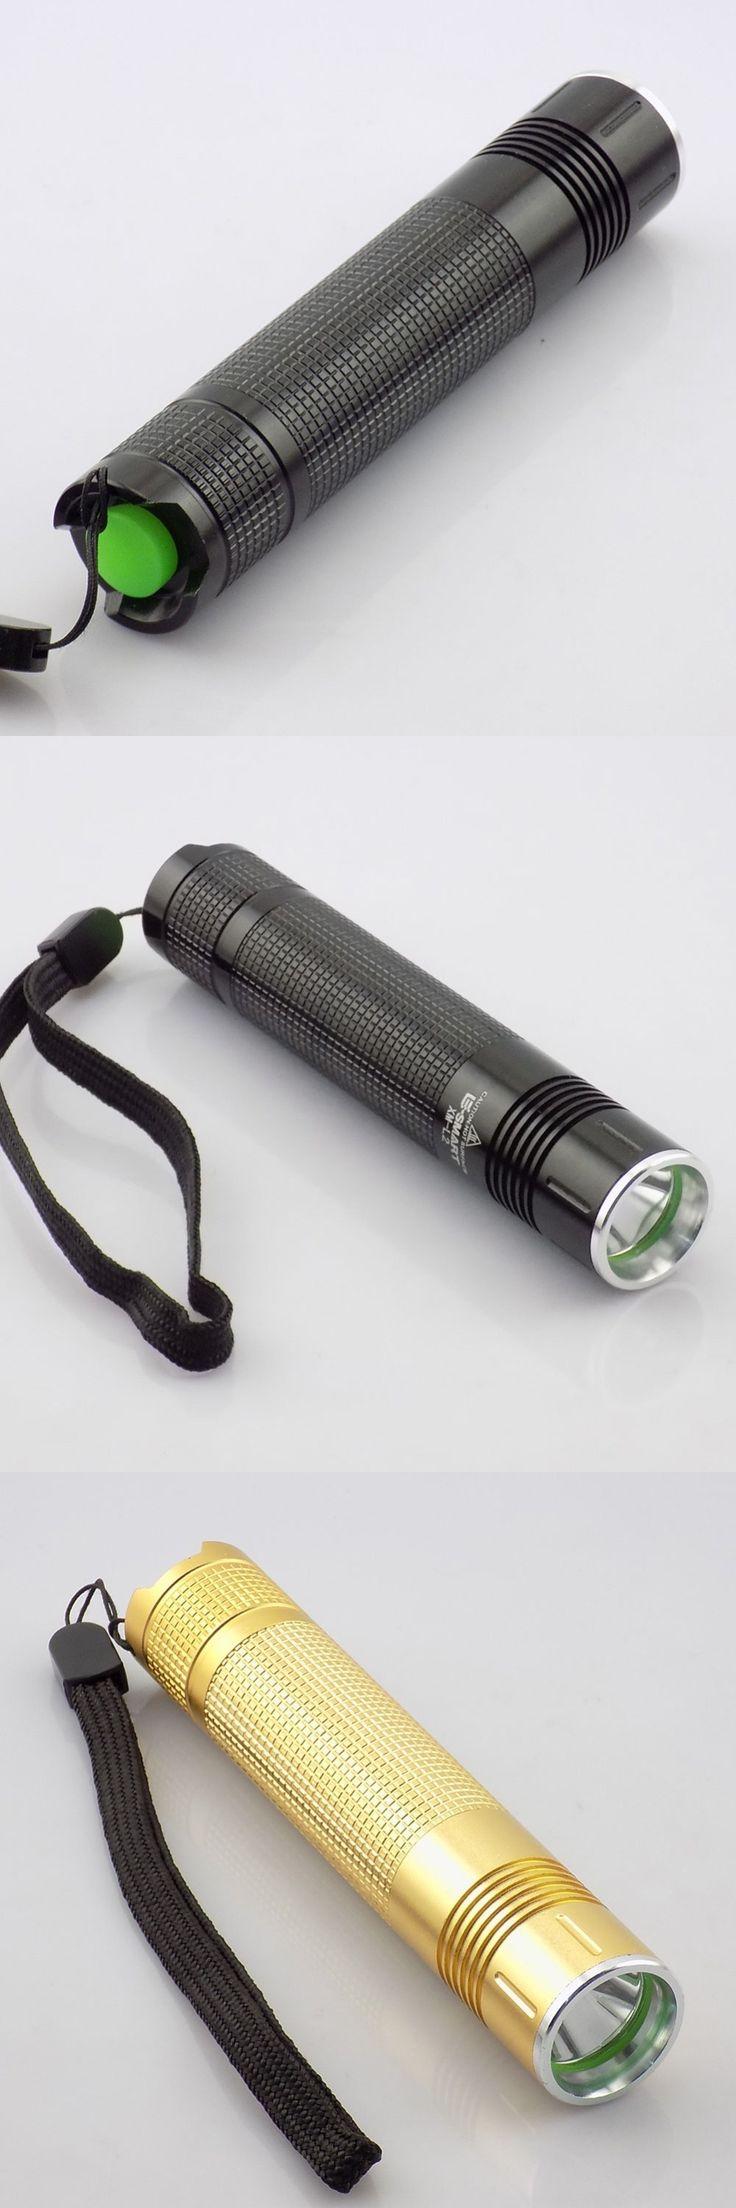 High Power flash light CREE XML L2 2000 Lumens mini led flashlight Torch linterna Protable Pocket Linternas Lampe Torche Camping